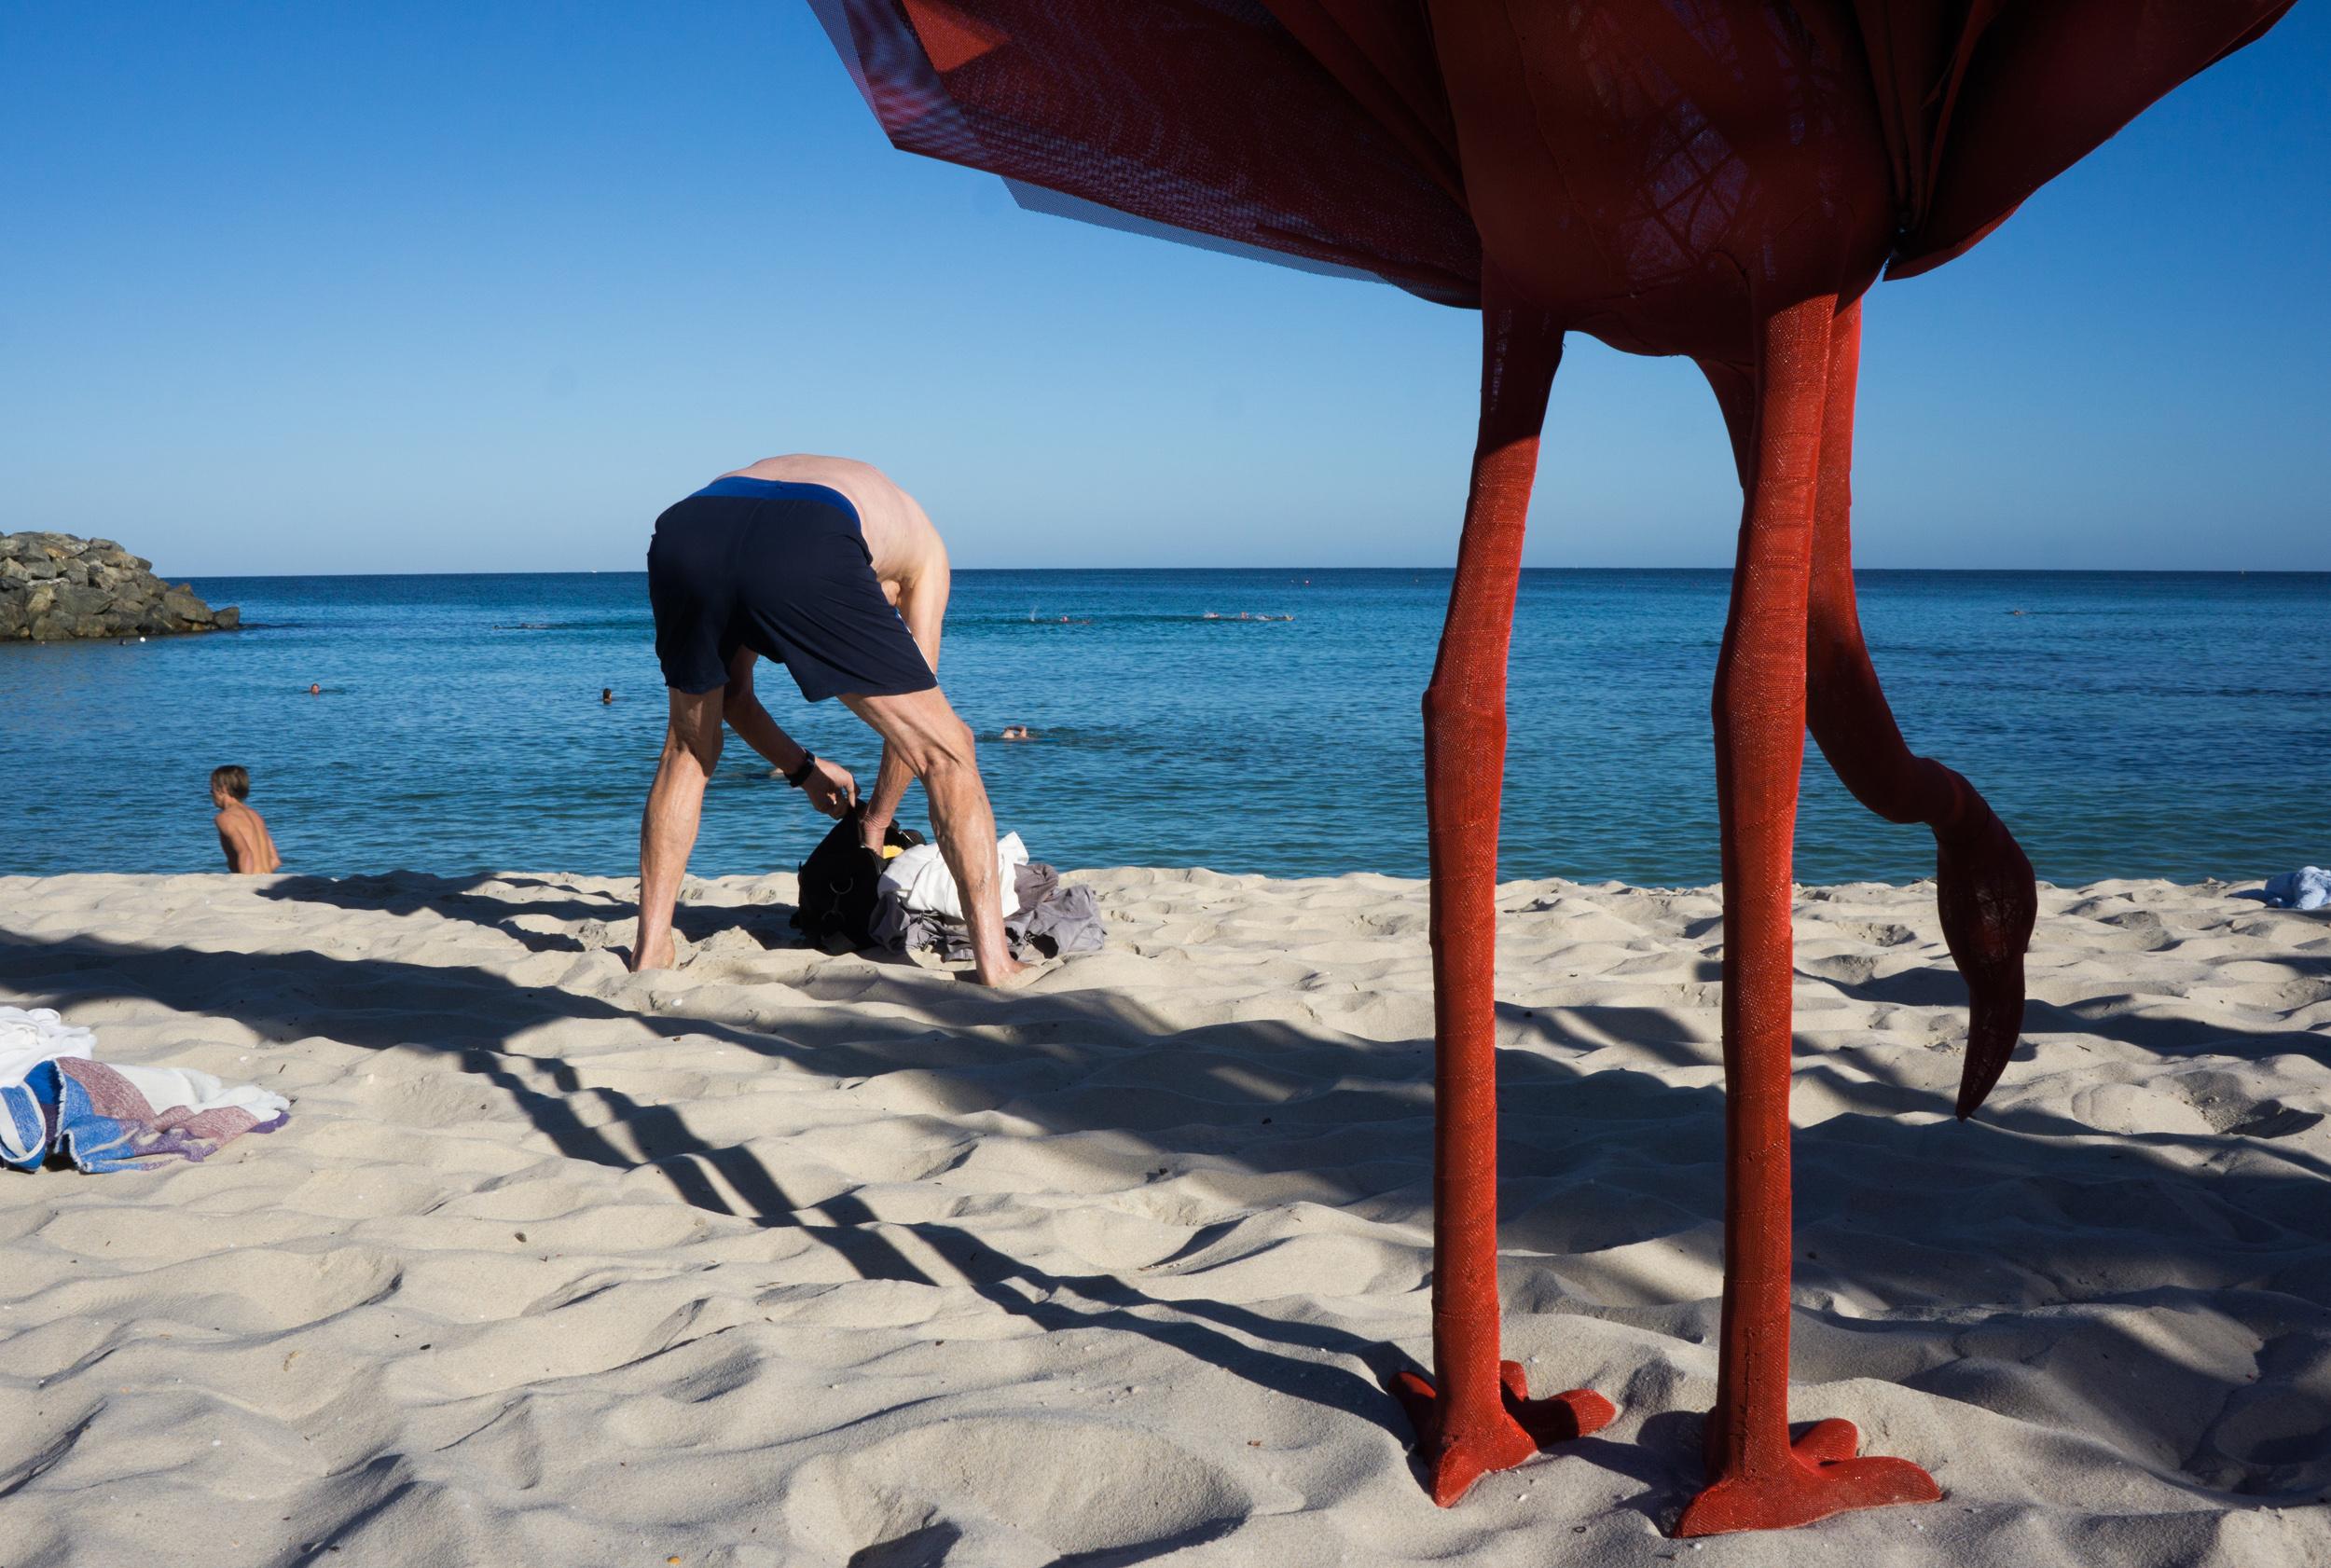 justin_tan_torres_australian_street_photography_beach_sculptures_by_the_sea_man_beach_cottesloe_perth_2015_07.jpg